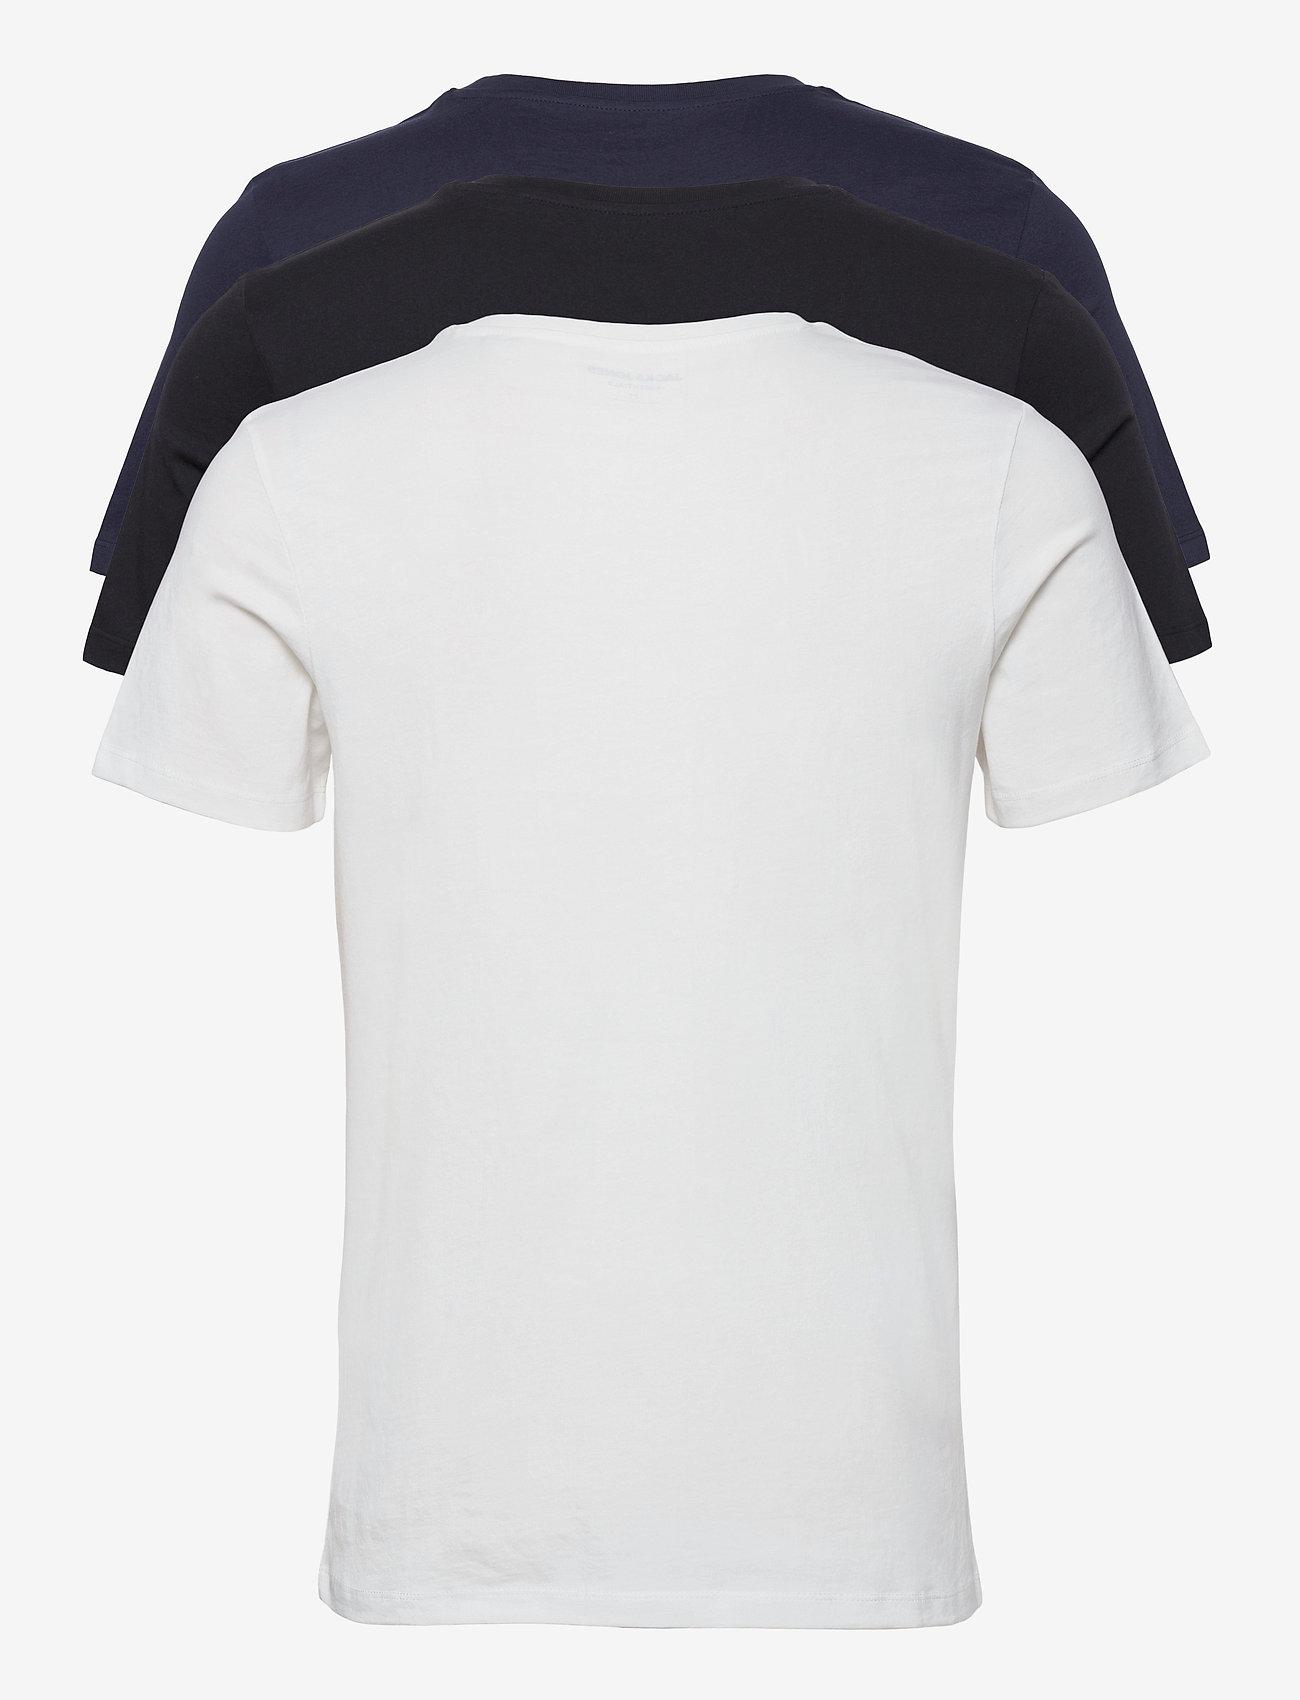 Jack & Jones - JJELOGO TEE SS O-NECK 2 COL SS21 3PK MP - kortärmade t-shirts - black - 1